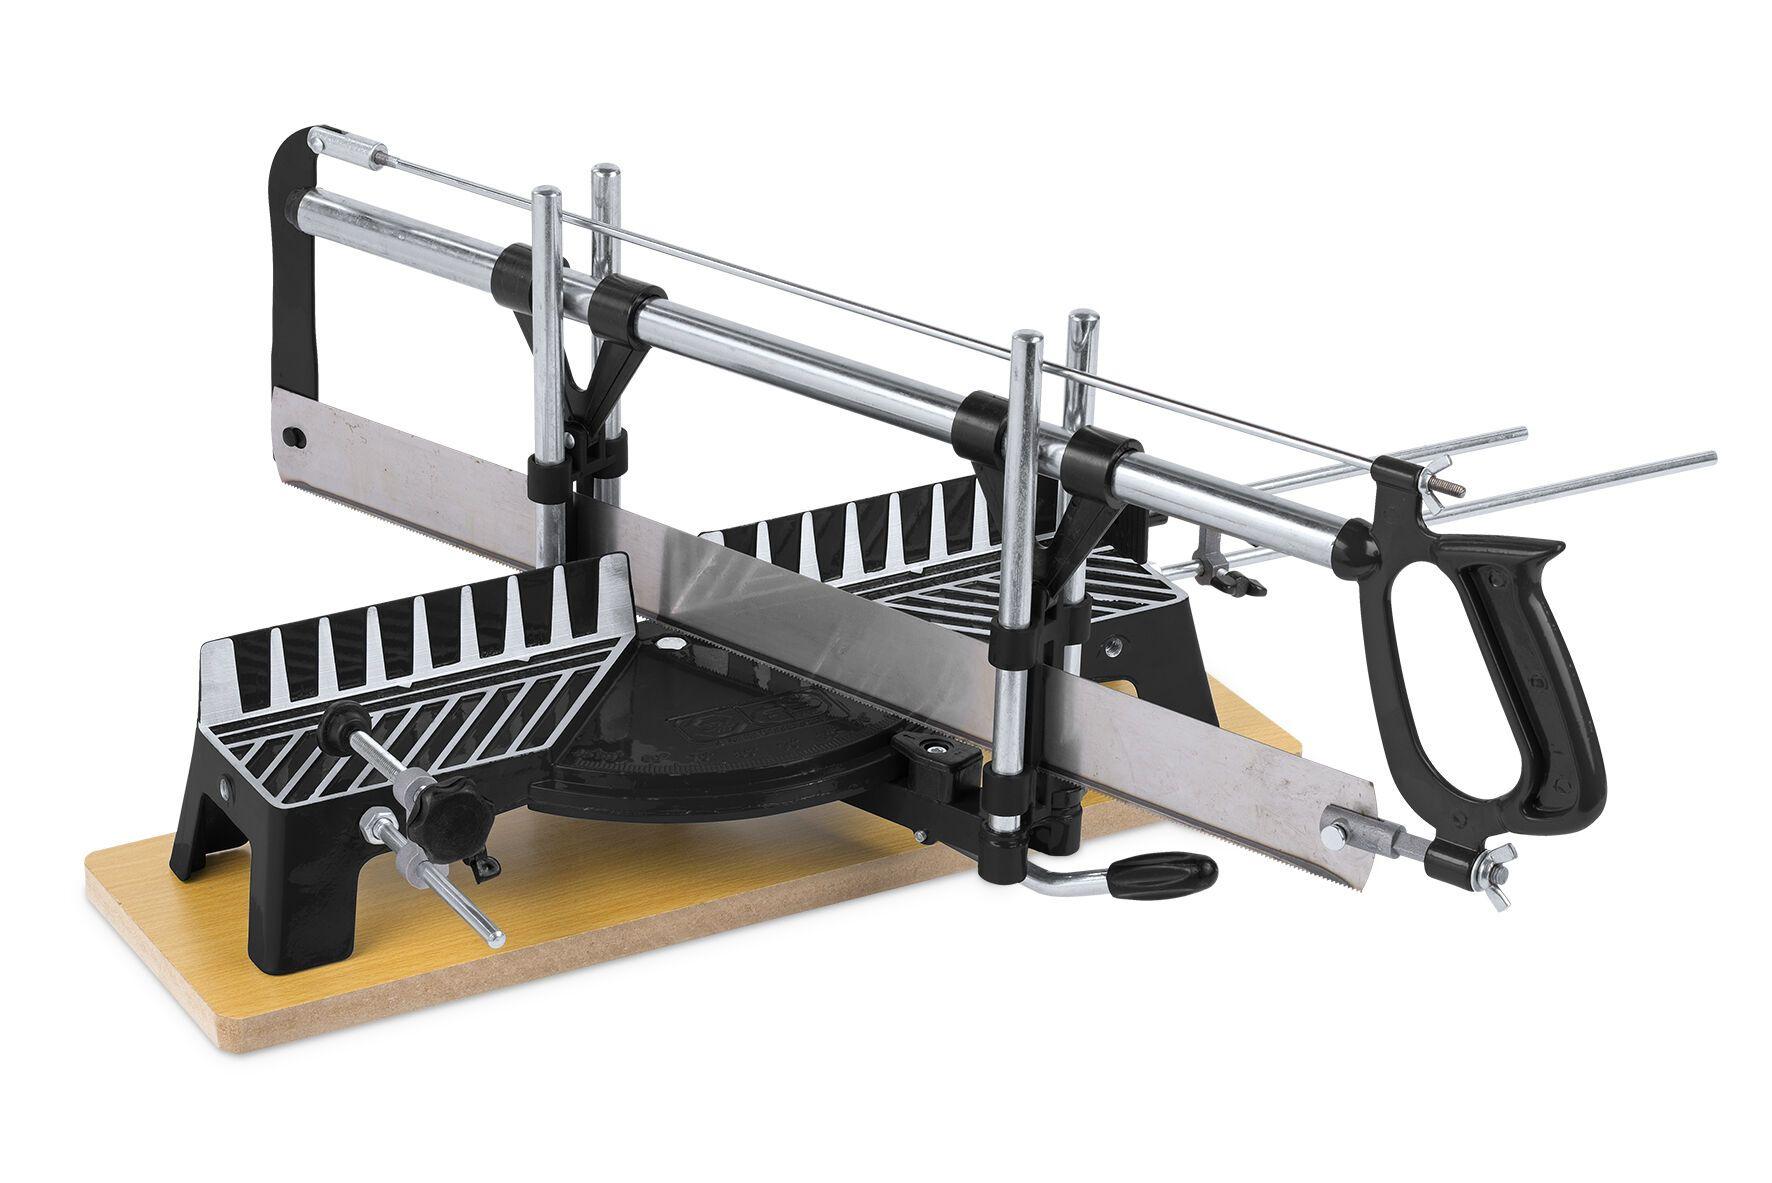 kreator krt811001 hand verstekzaag 550mm van melis. Black Bedroom Furniture Sets. Home Design Ideas